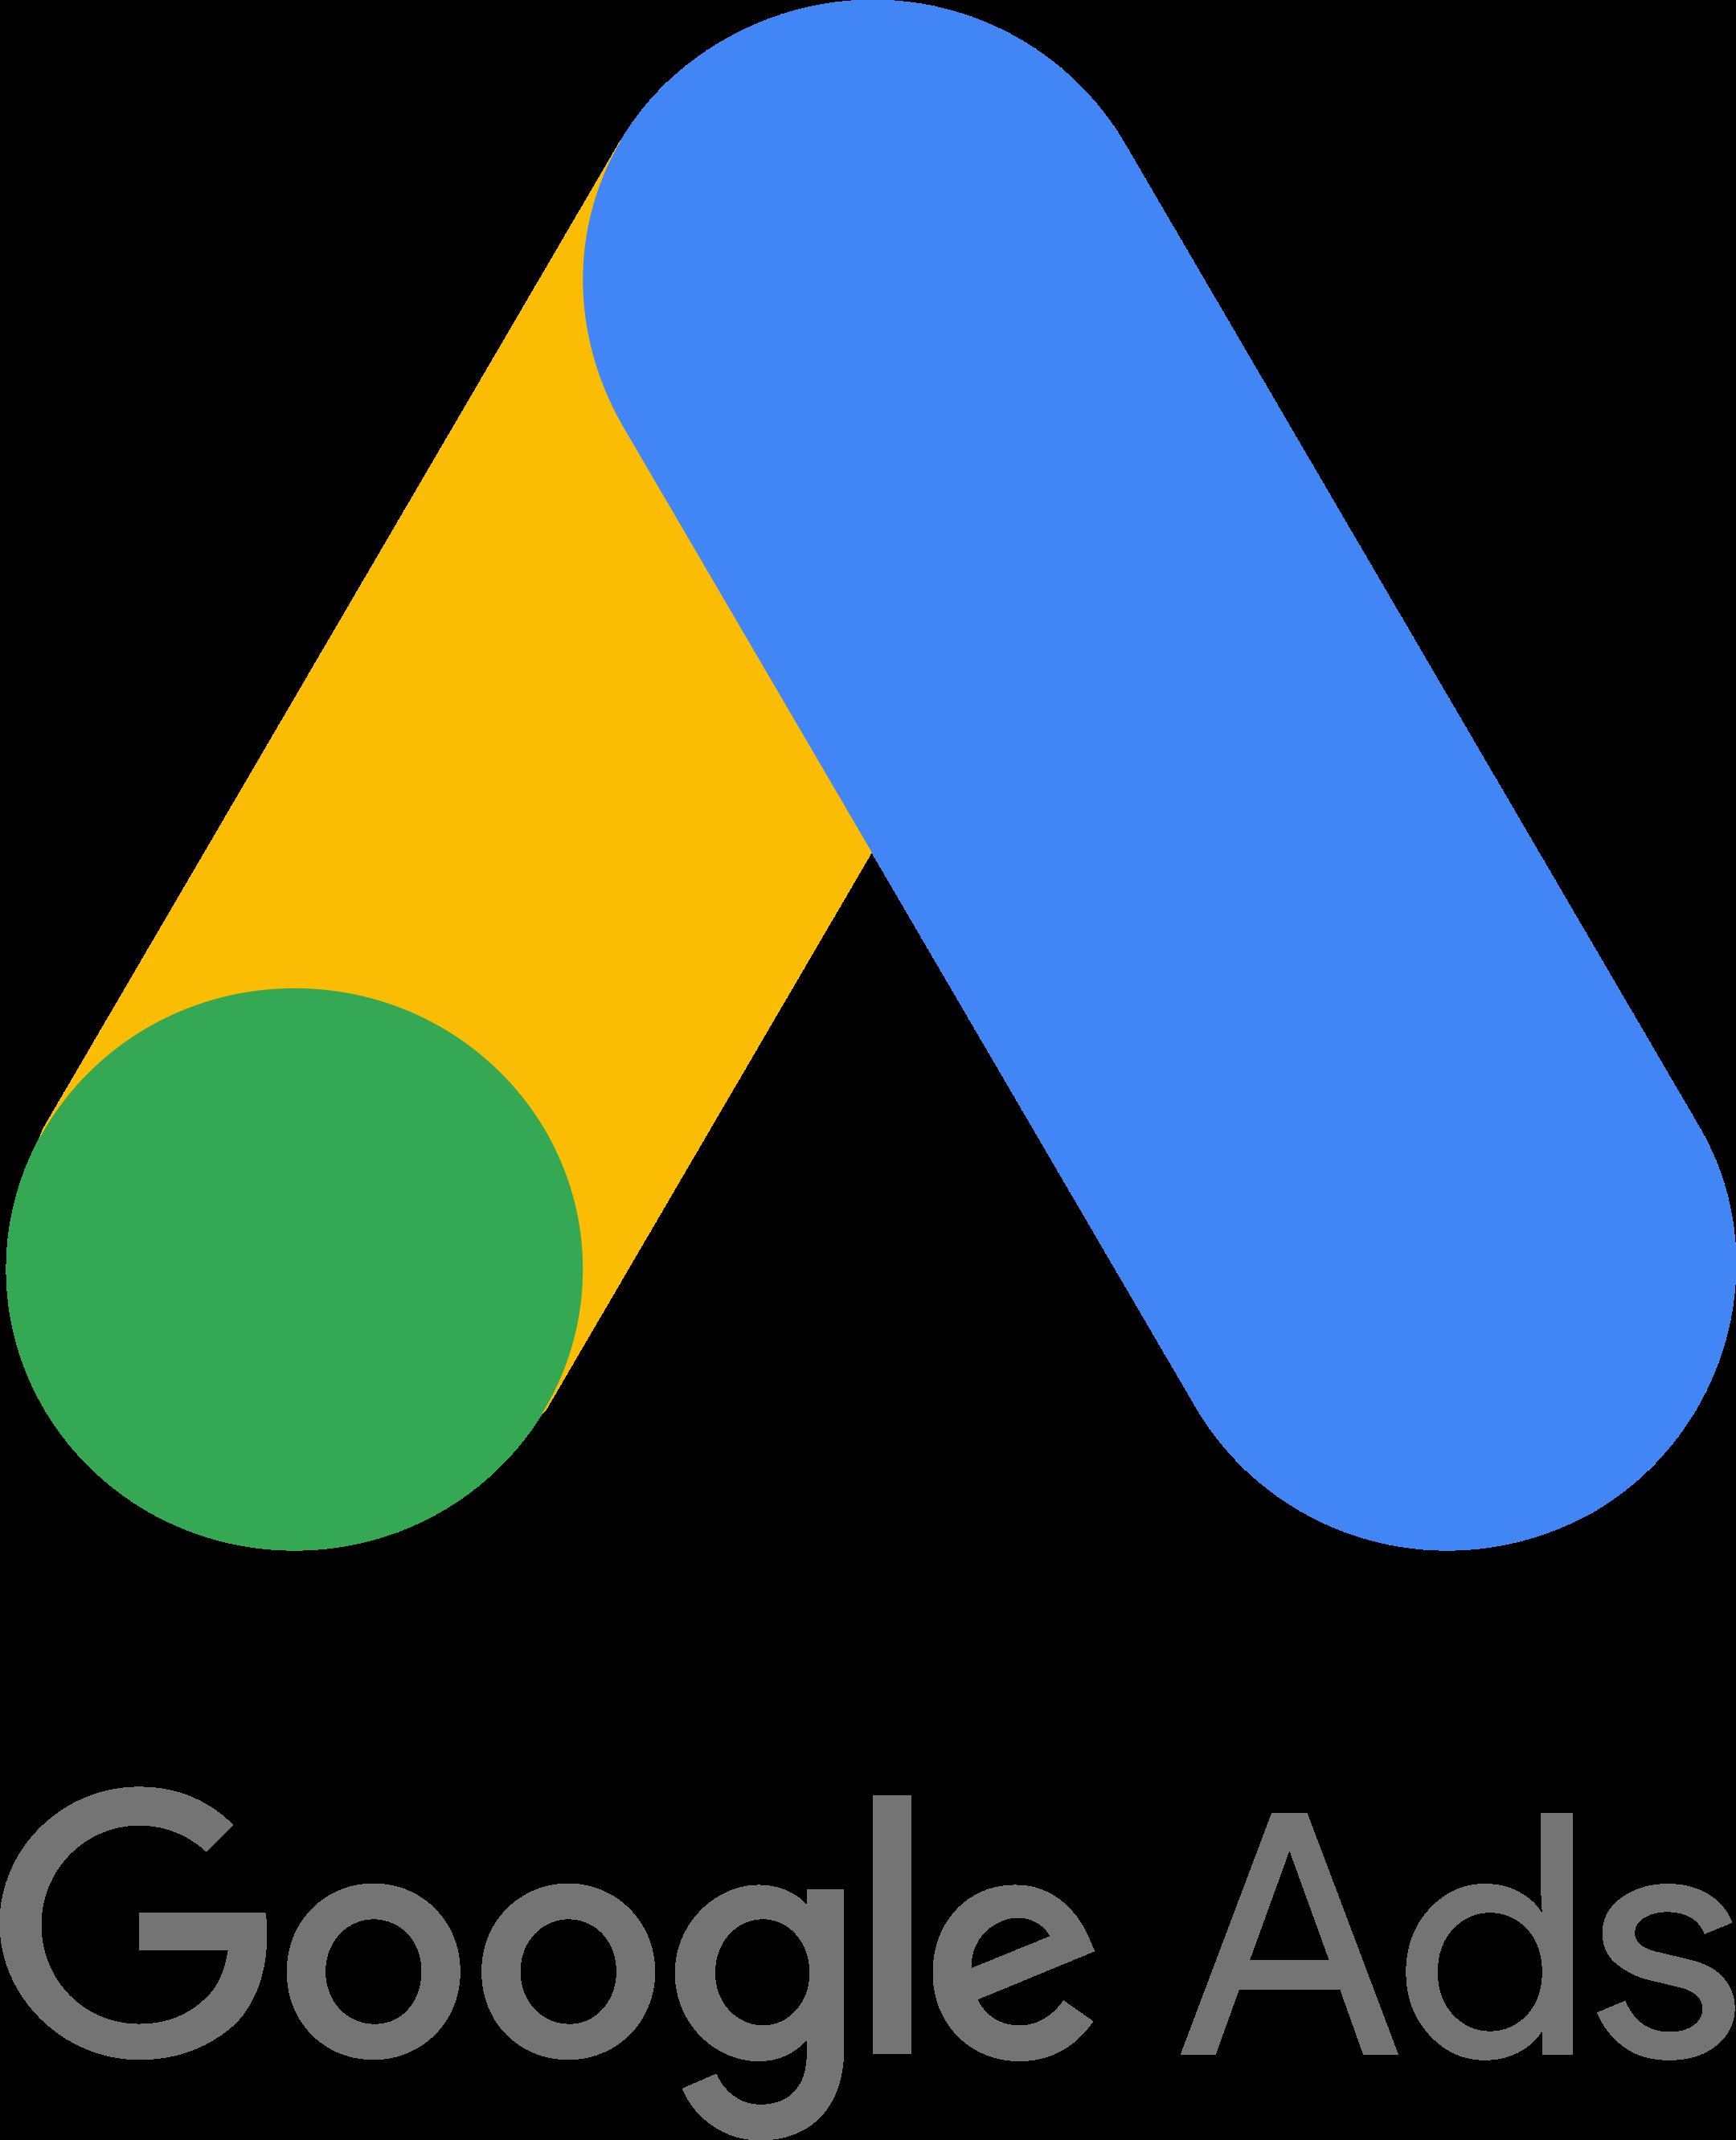 google-adwords-logo-6